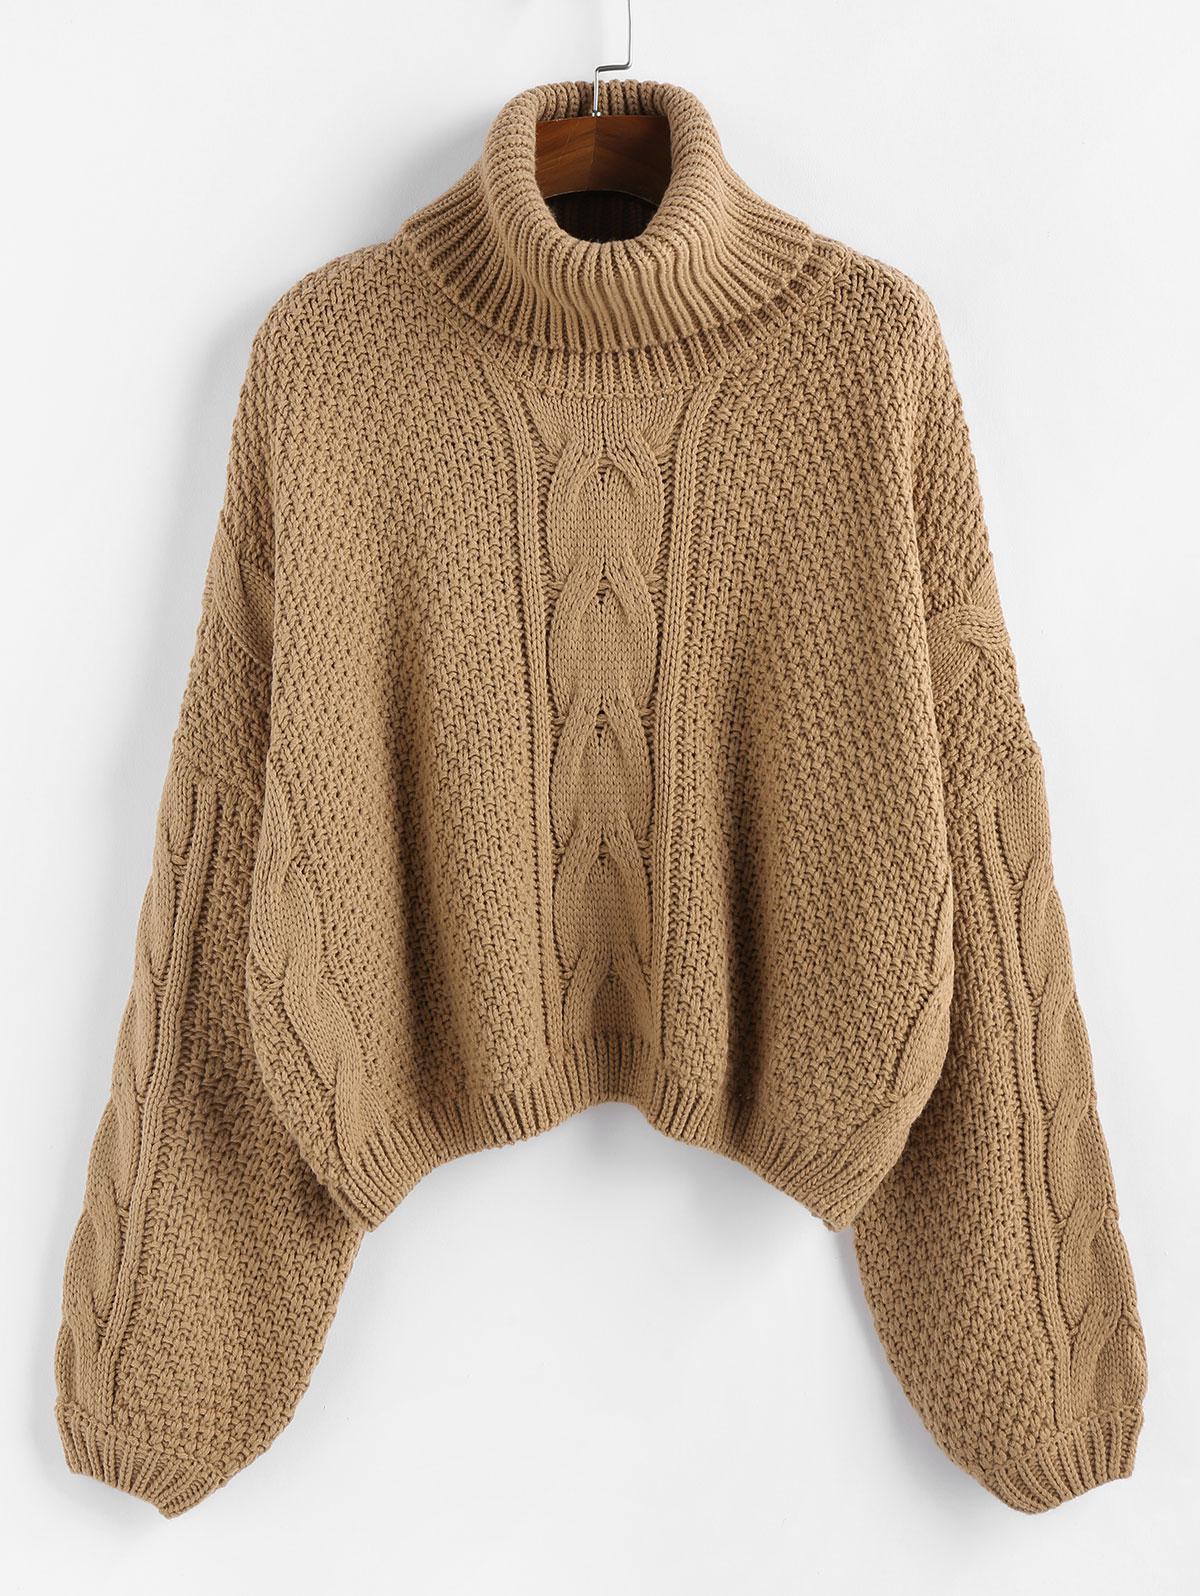 ZAFUL X Luna Montana Drop Shoulder Cable Knit Turtleneck Sweater